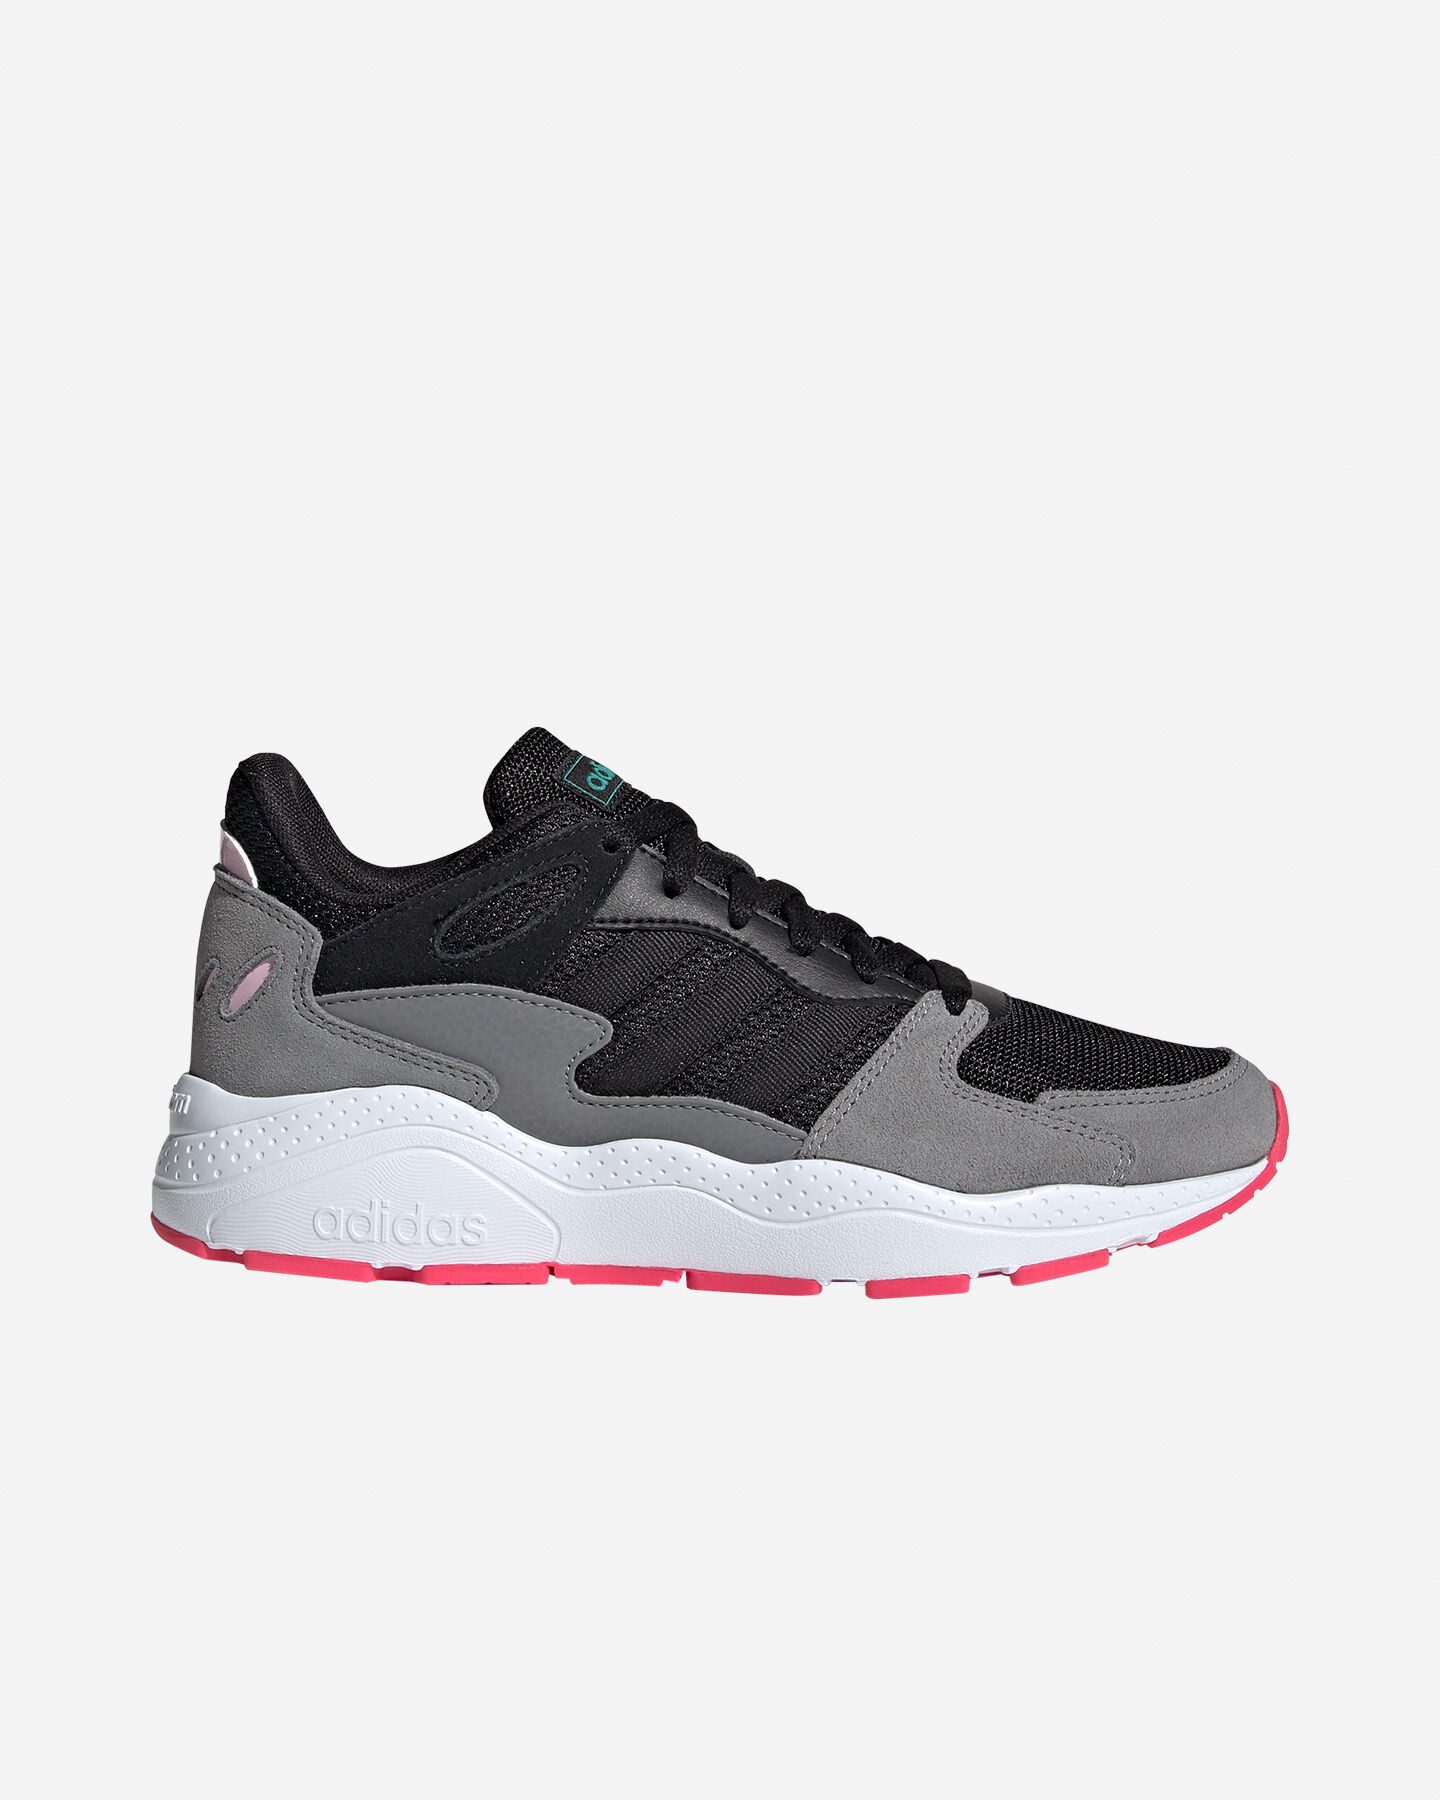 Adidas Passeggio Adidas Uomo Scarpe Scarpe 5LA4Rj